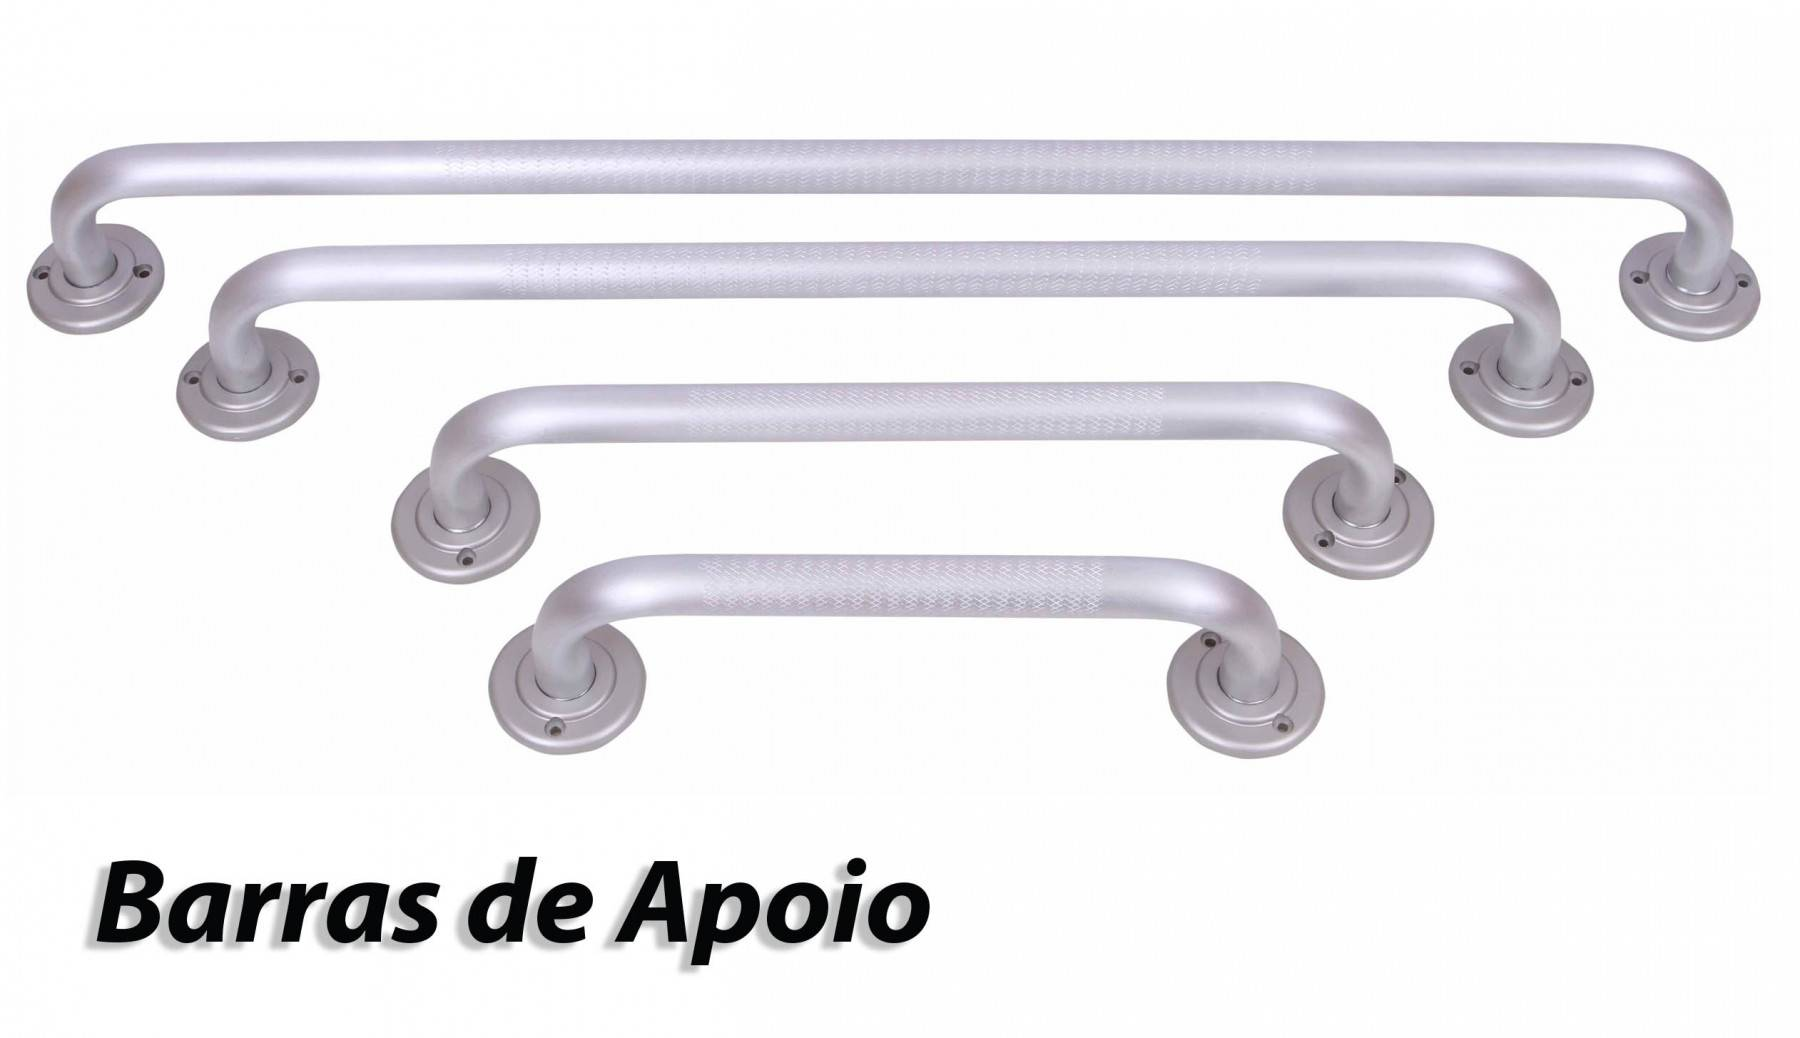 Barra de apoio 80cm de alum nio sequencial compre aqui na - Barras de aluminio huecas ...